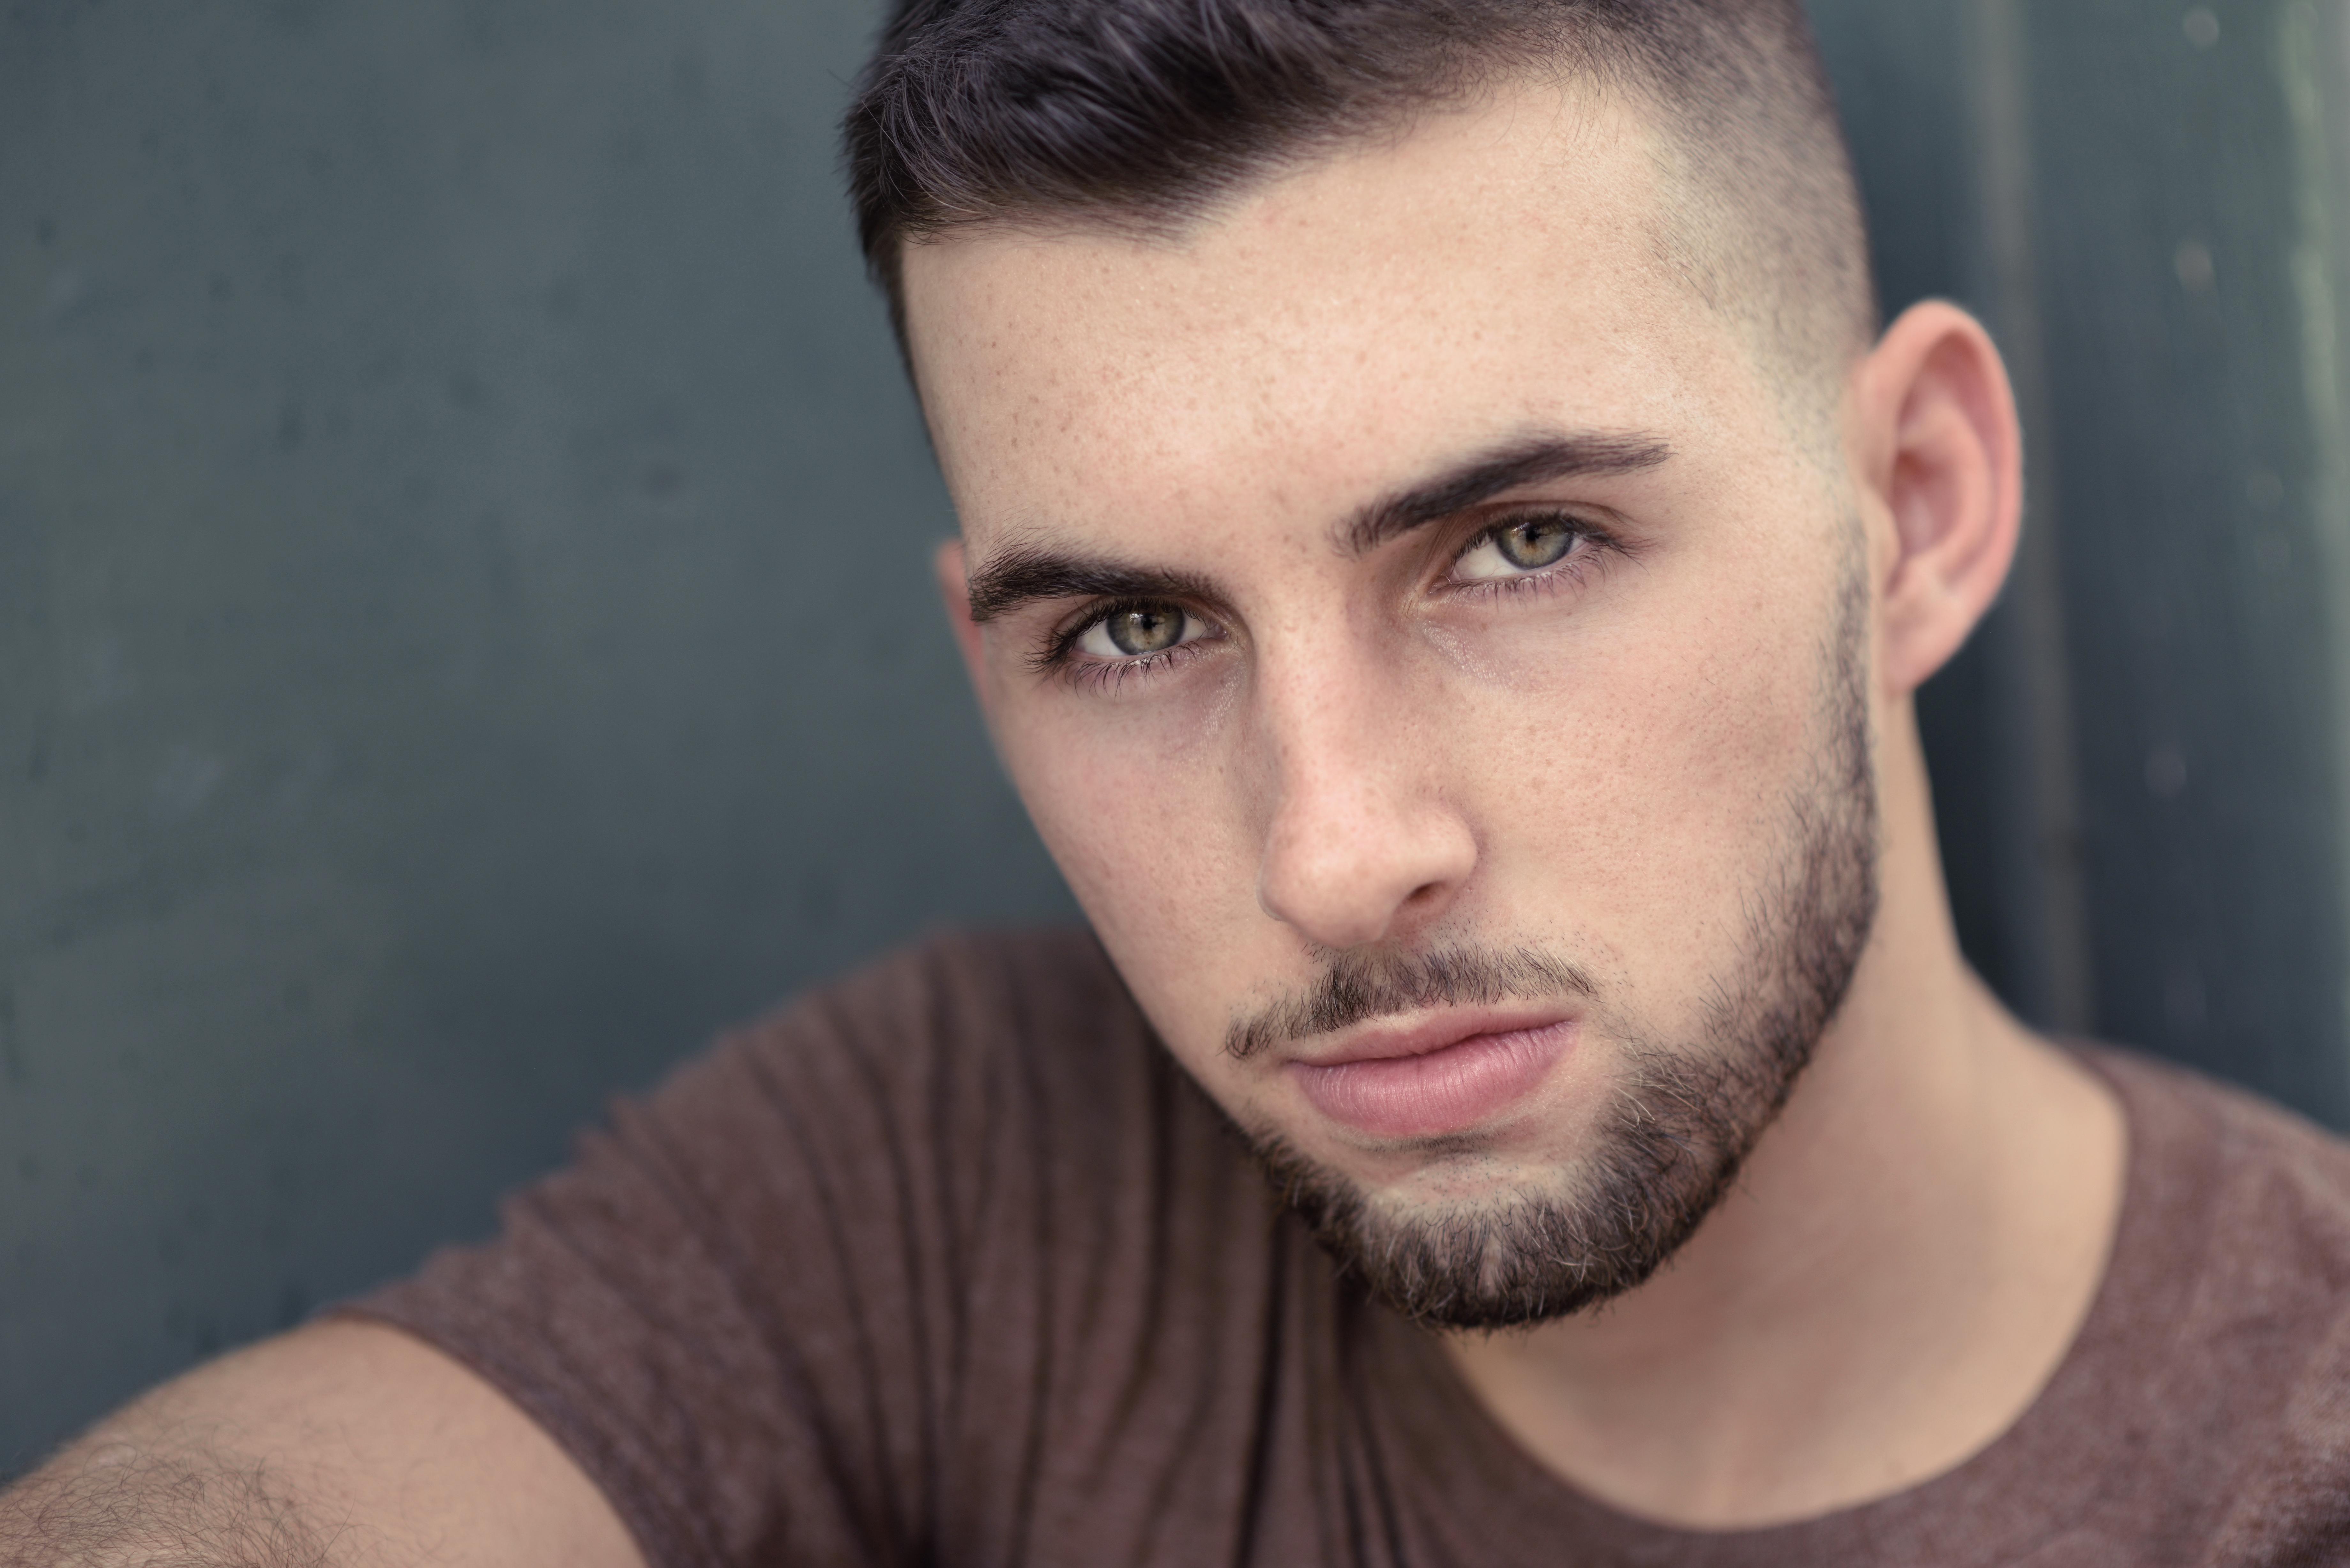 Actor Headshots Outdoors in Bradenton